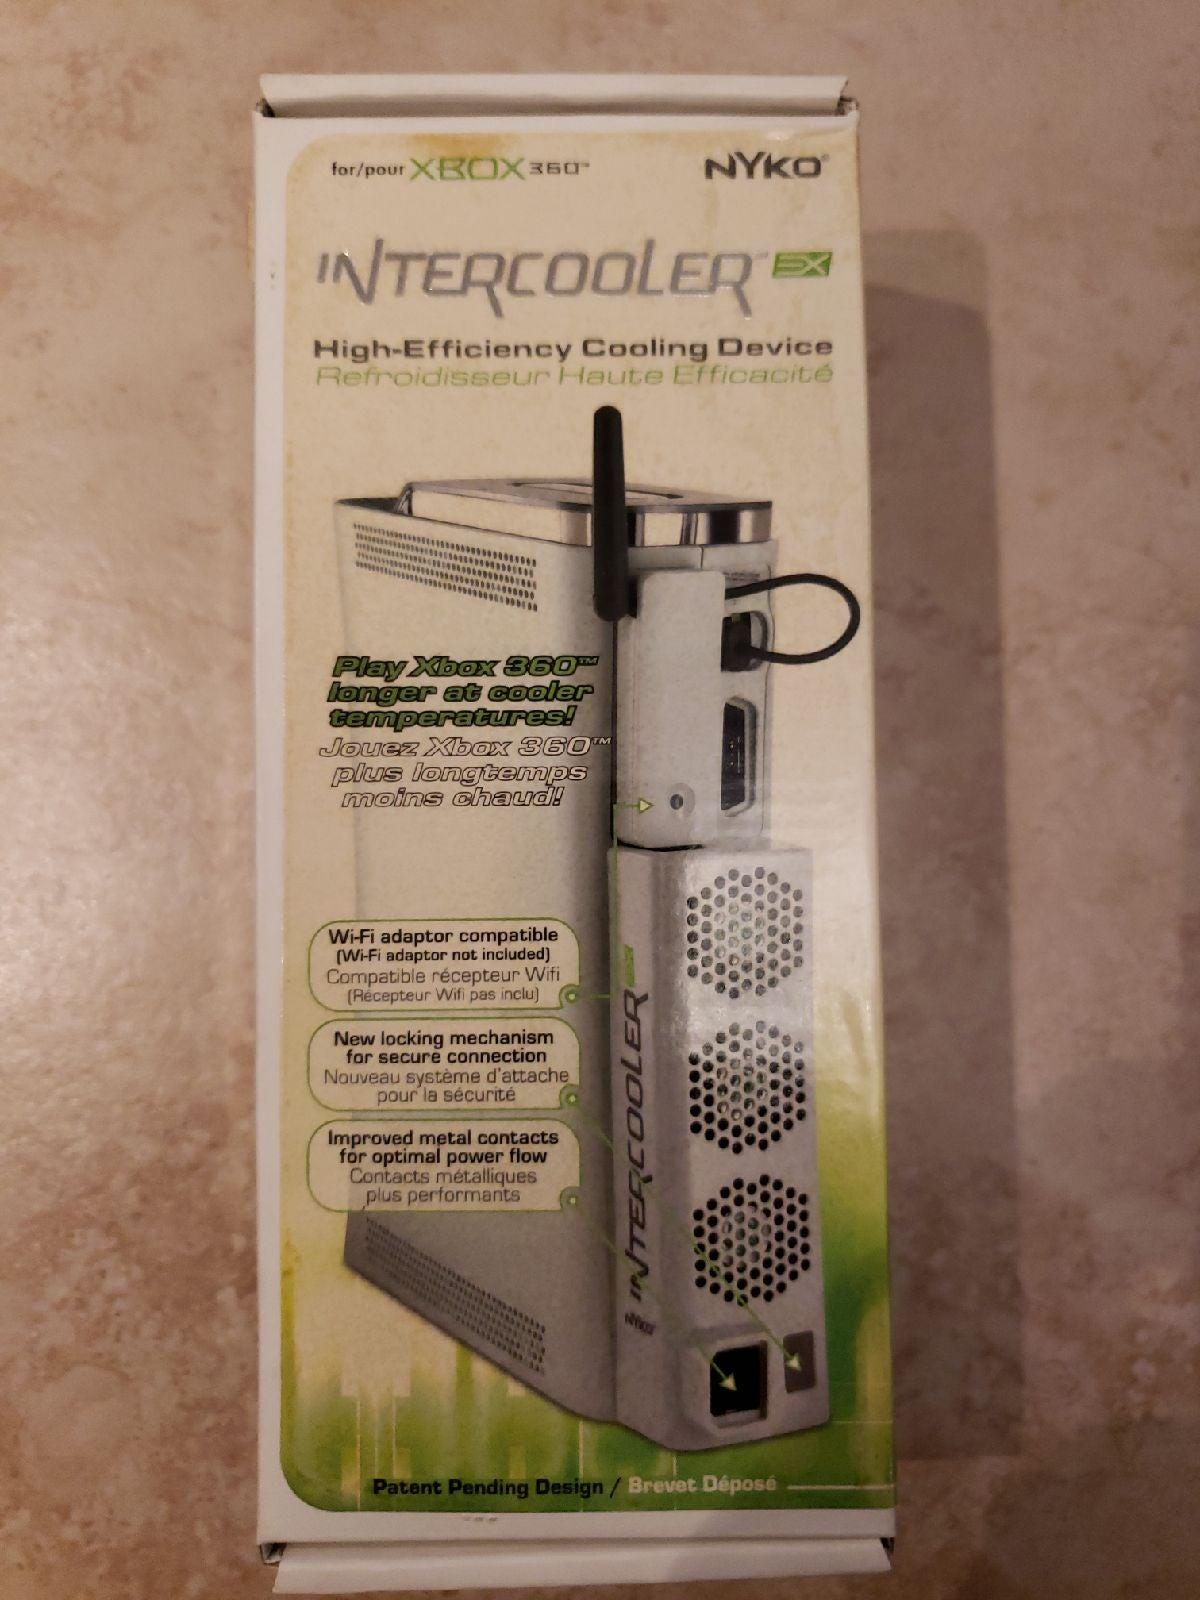 XBOX 360 Intercooler EX